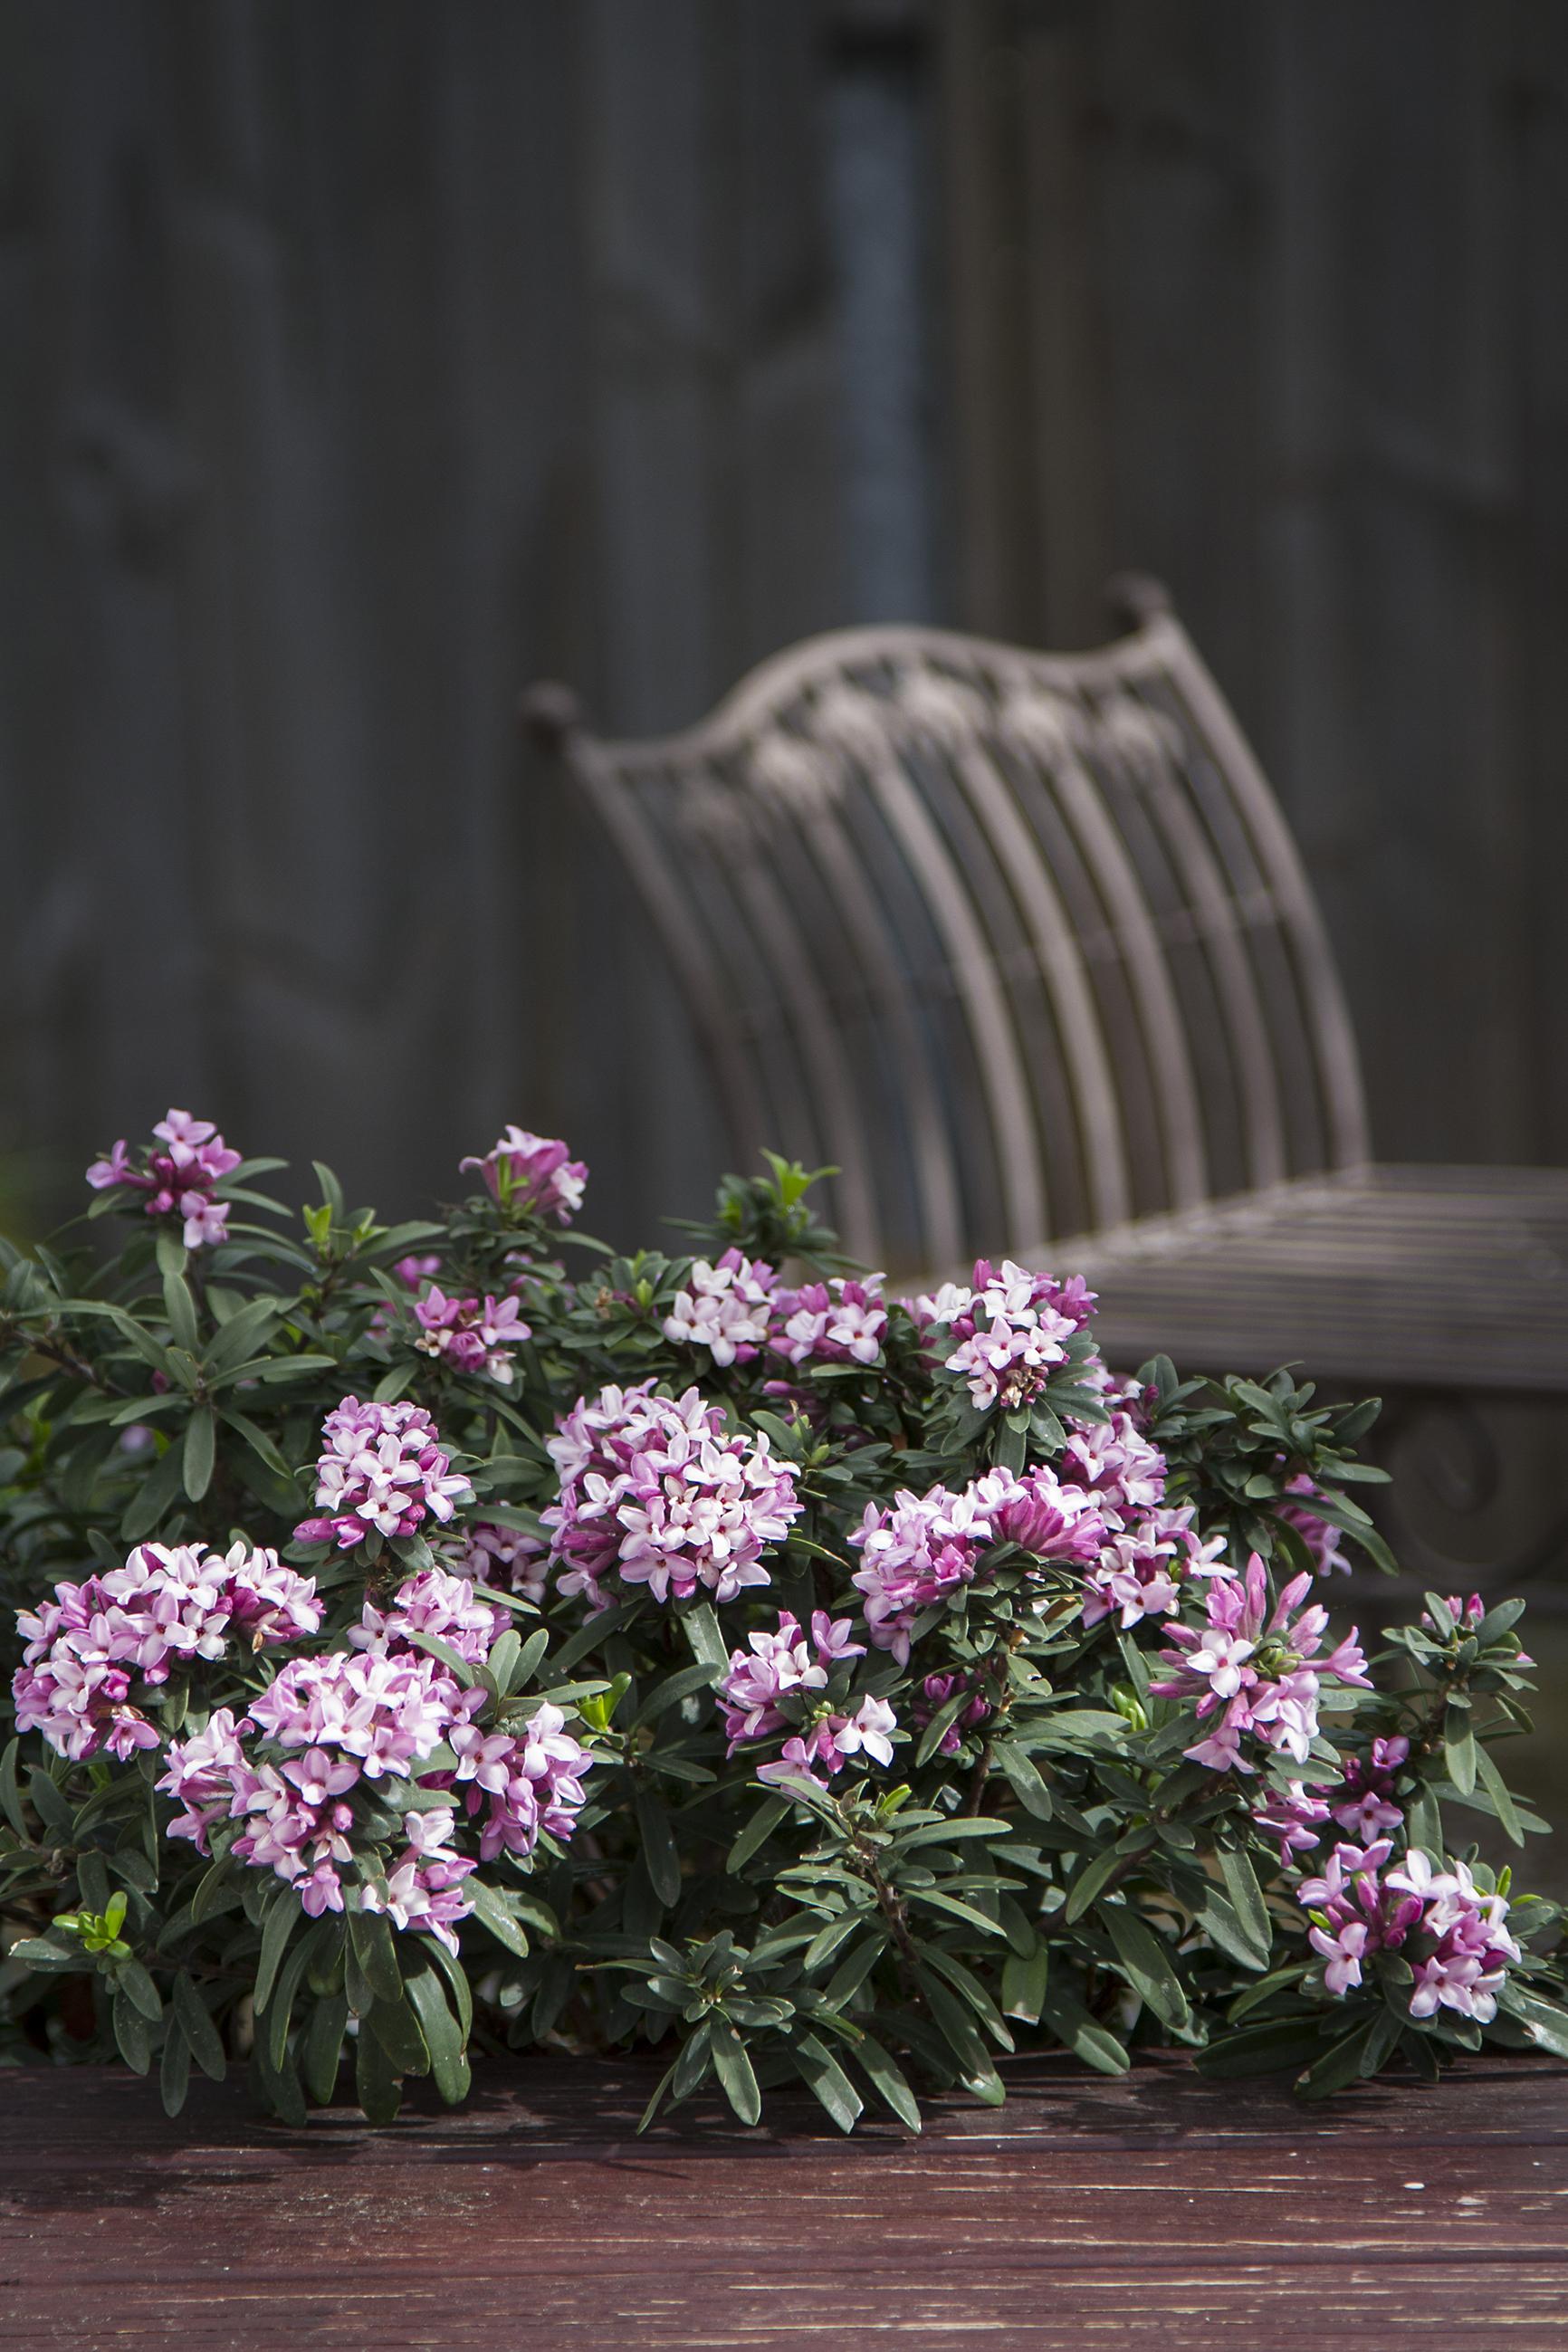 d spring pink pma.jpg